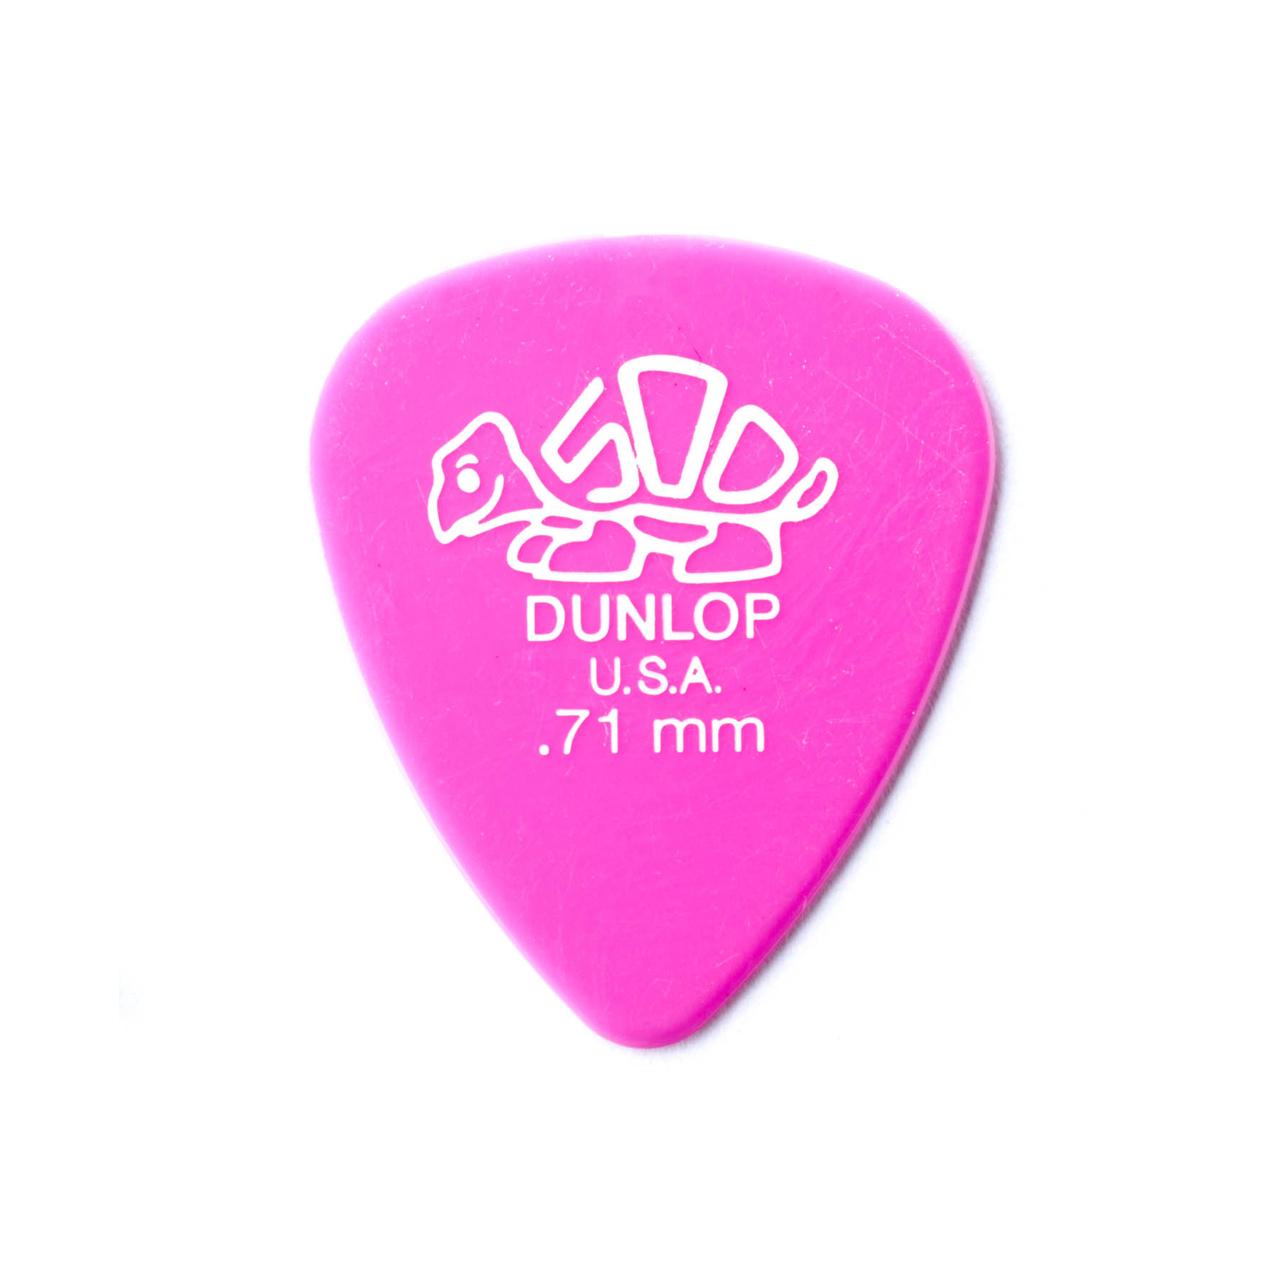 Palheta Delrin 500 0,71mm Pct C/72 41r.71 Dunlop  - Audio Video & cia